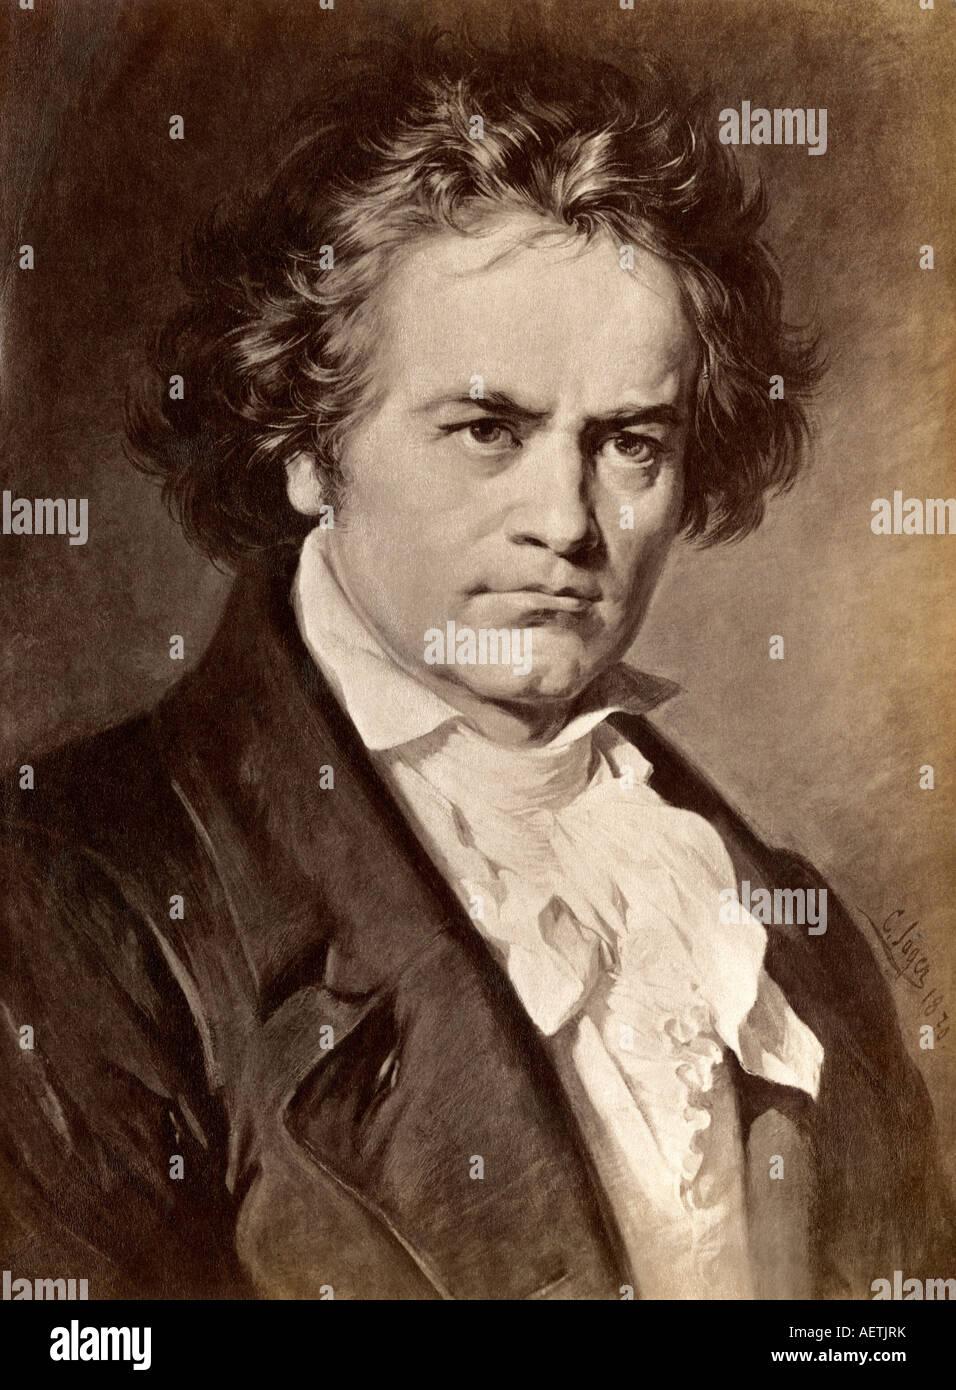 Ludwig van Beethoven. Foto einer Abbildung Stockfoto